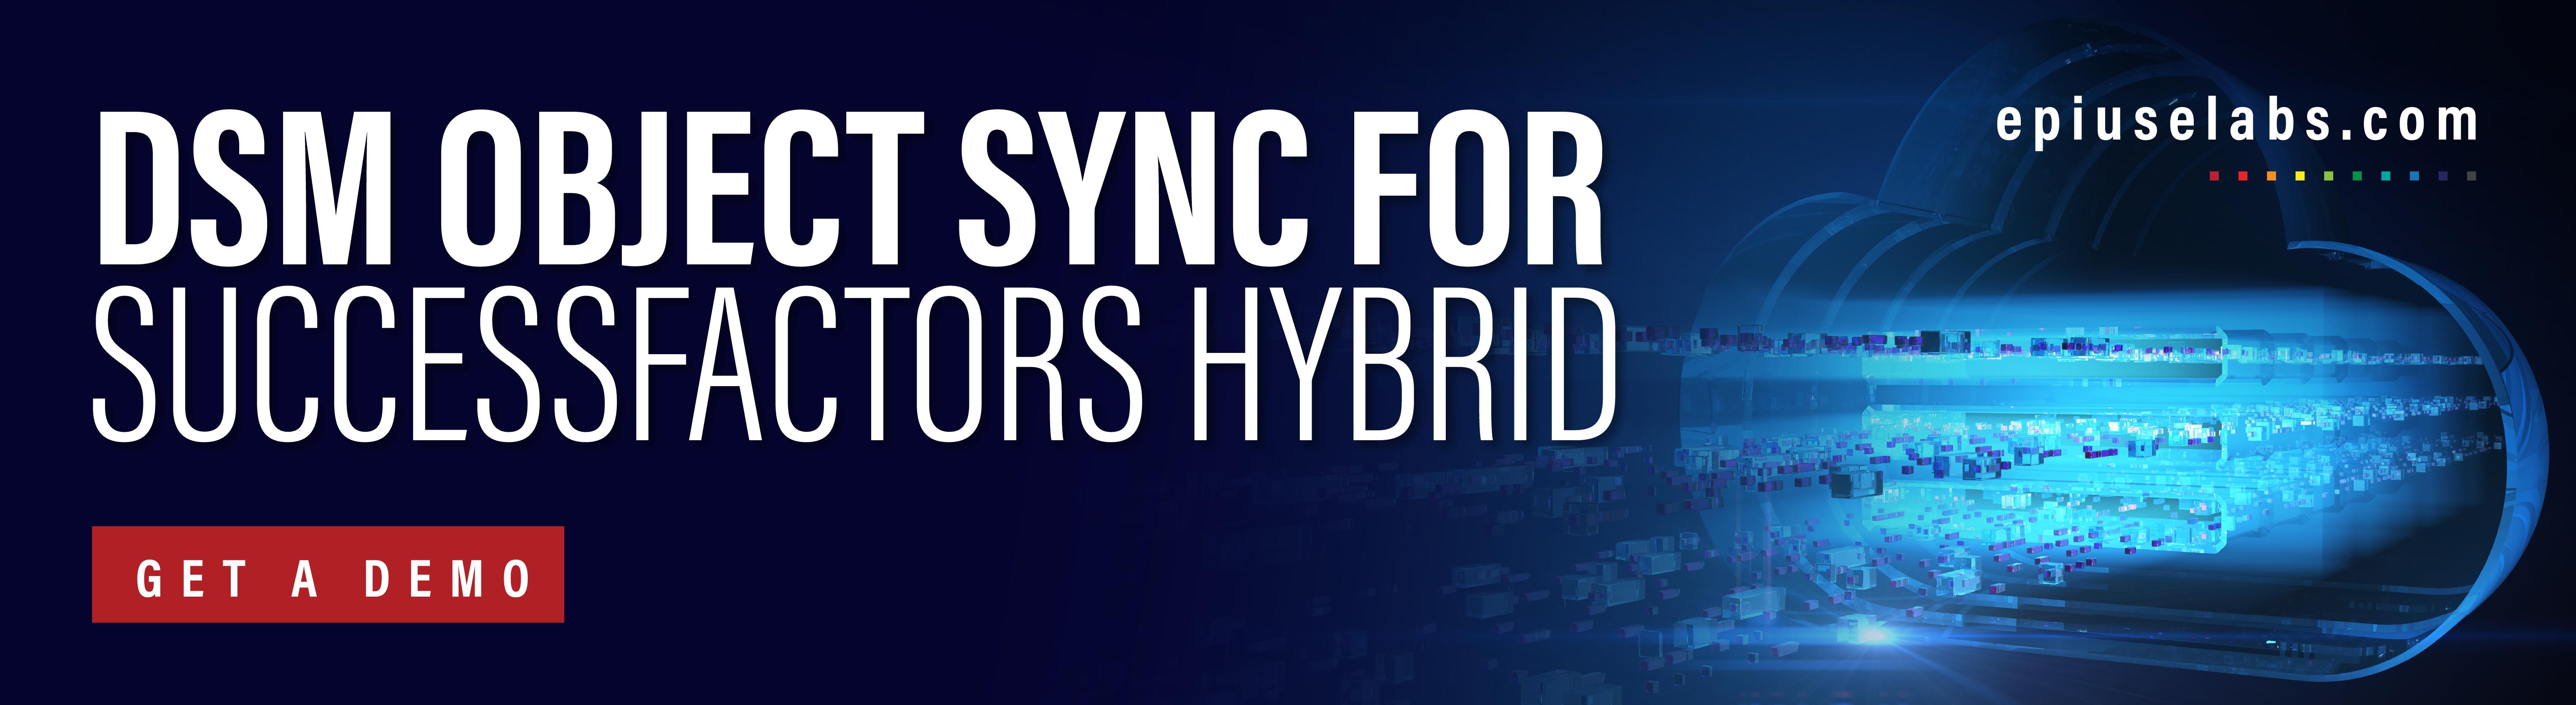 DSM Object Sync for -SuccessFactors Hybrid